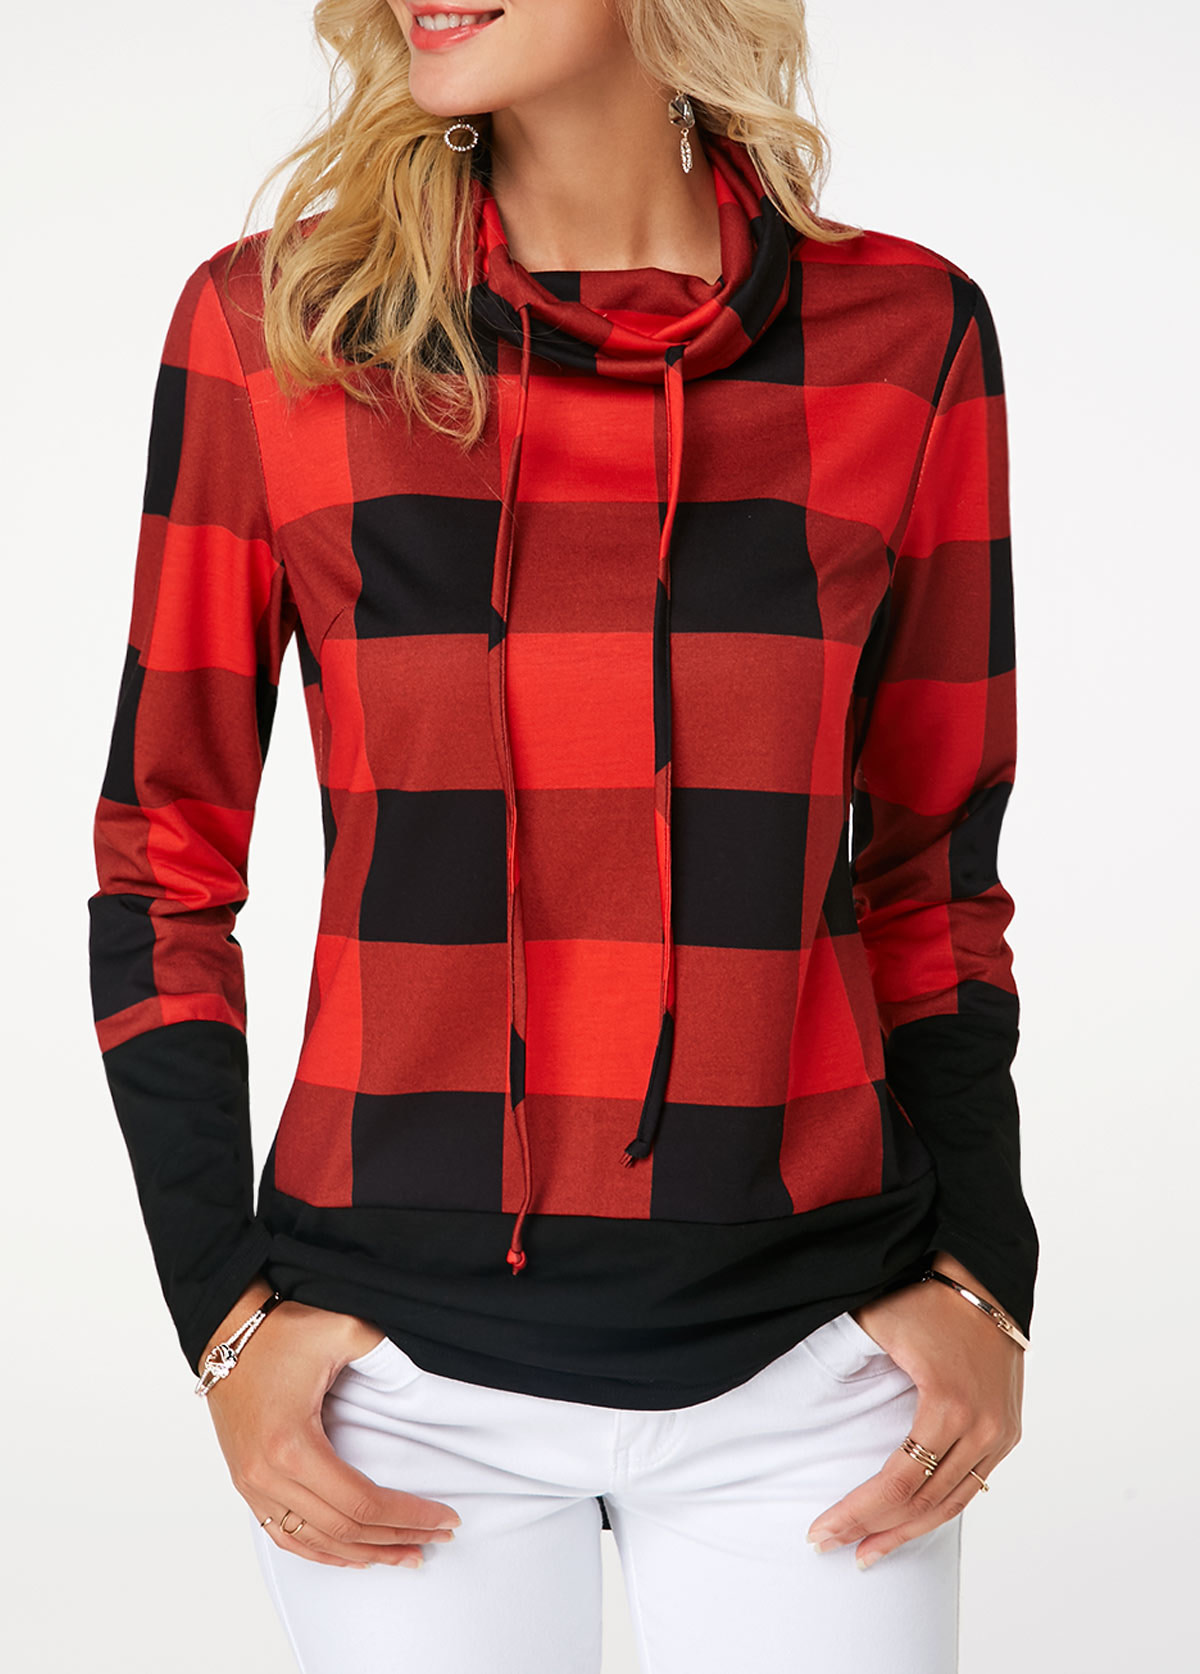 Women's Plaid Print Turtleneck Hoodie, Casual Long Sleeve Women's Plus Size Sweatshirt 5